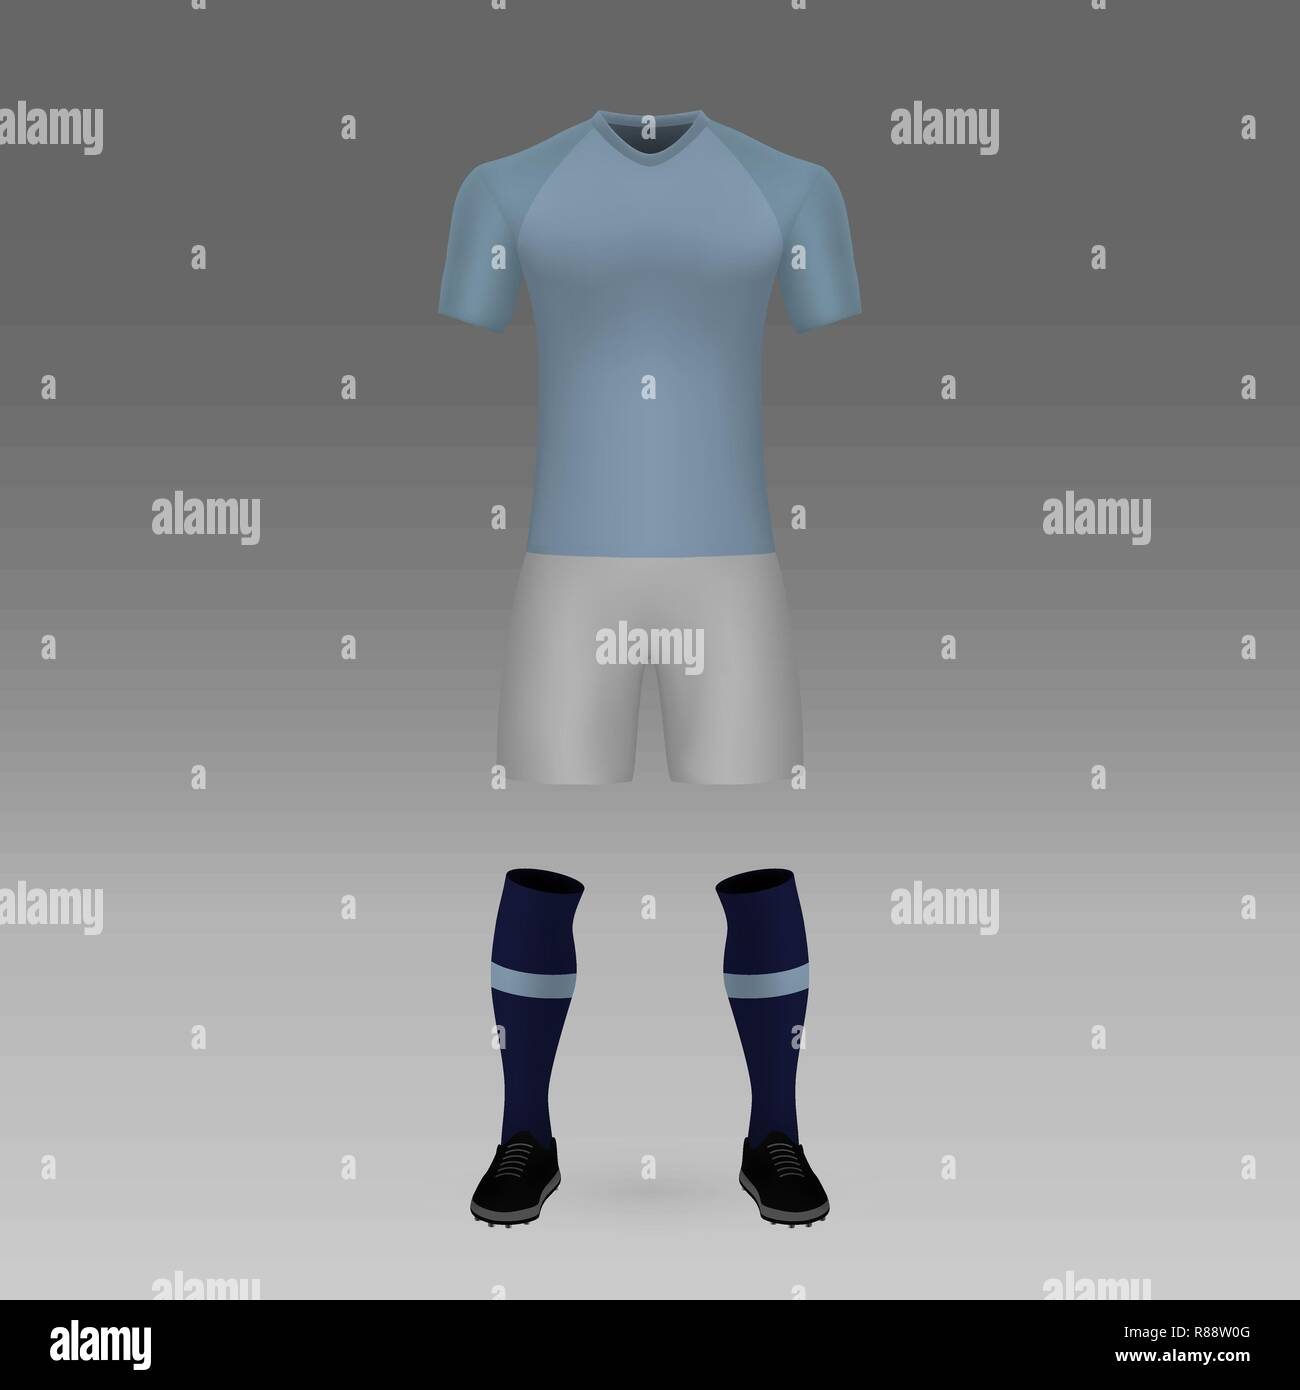 finest selection 9c3e5 43de2 football kit Manchester City, shirt template for soccer ...